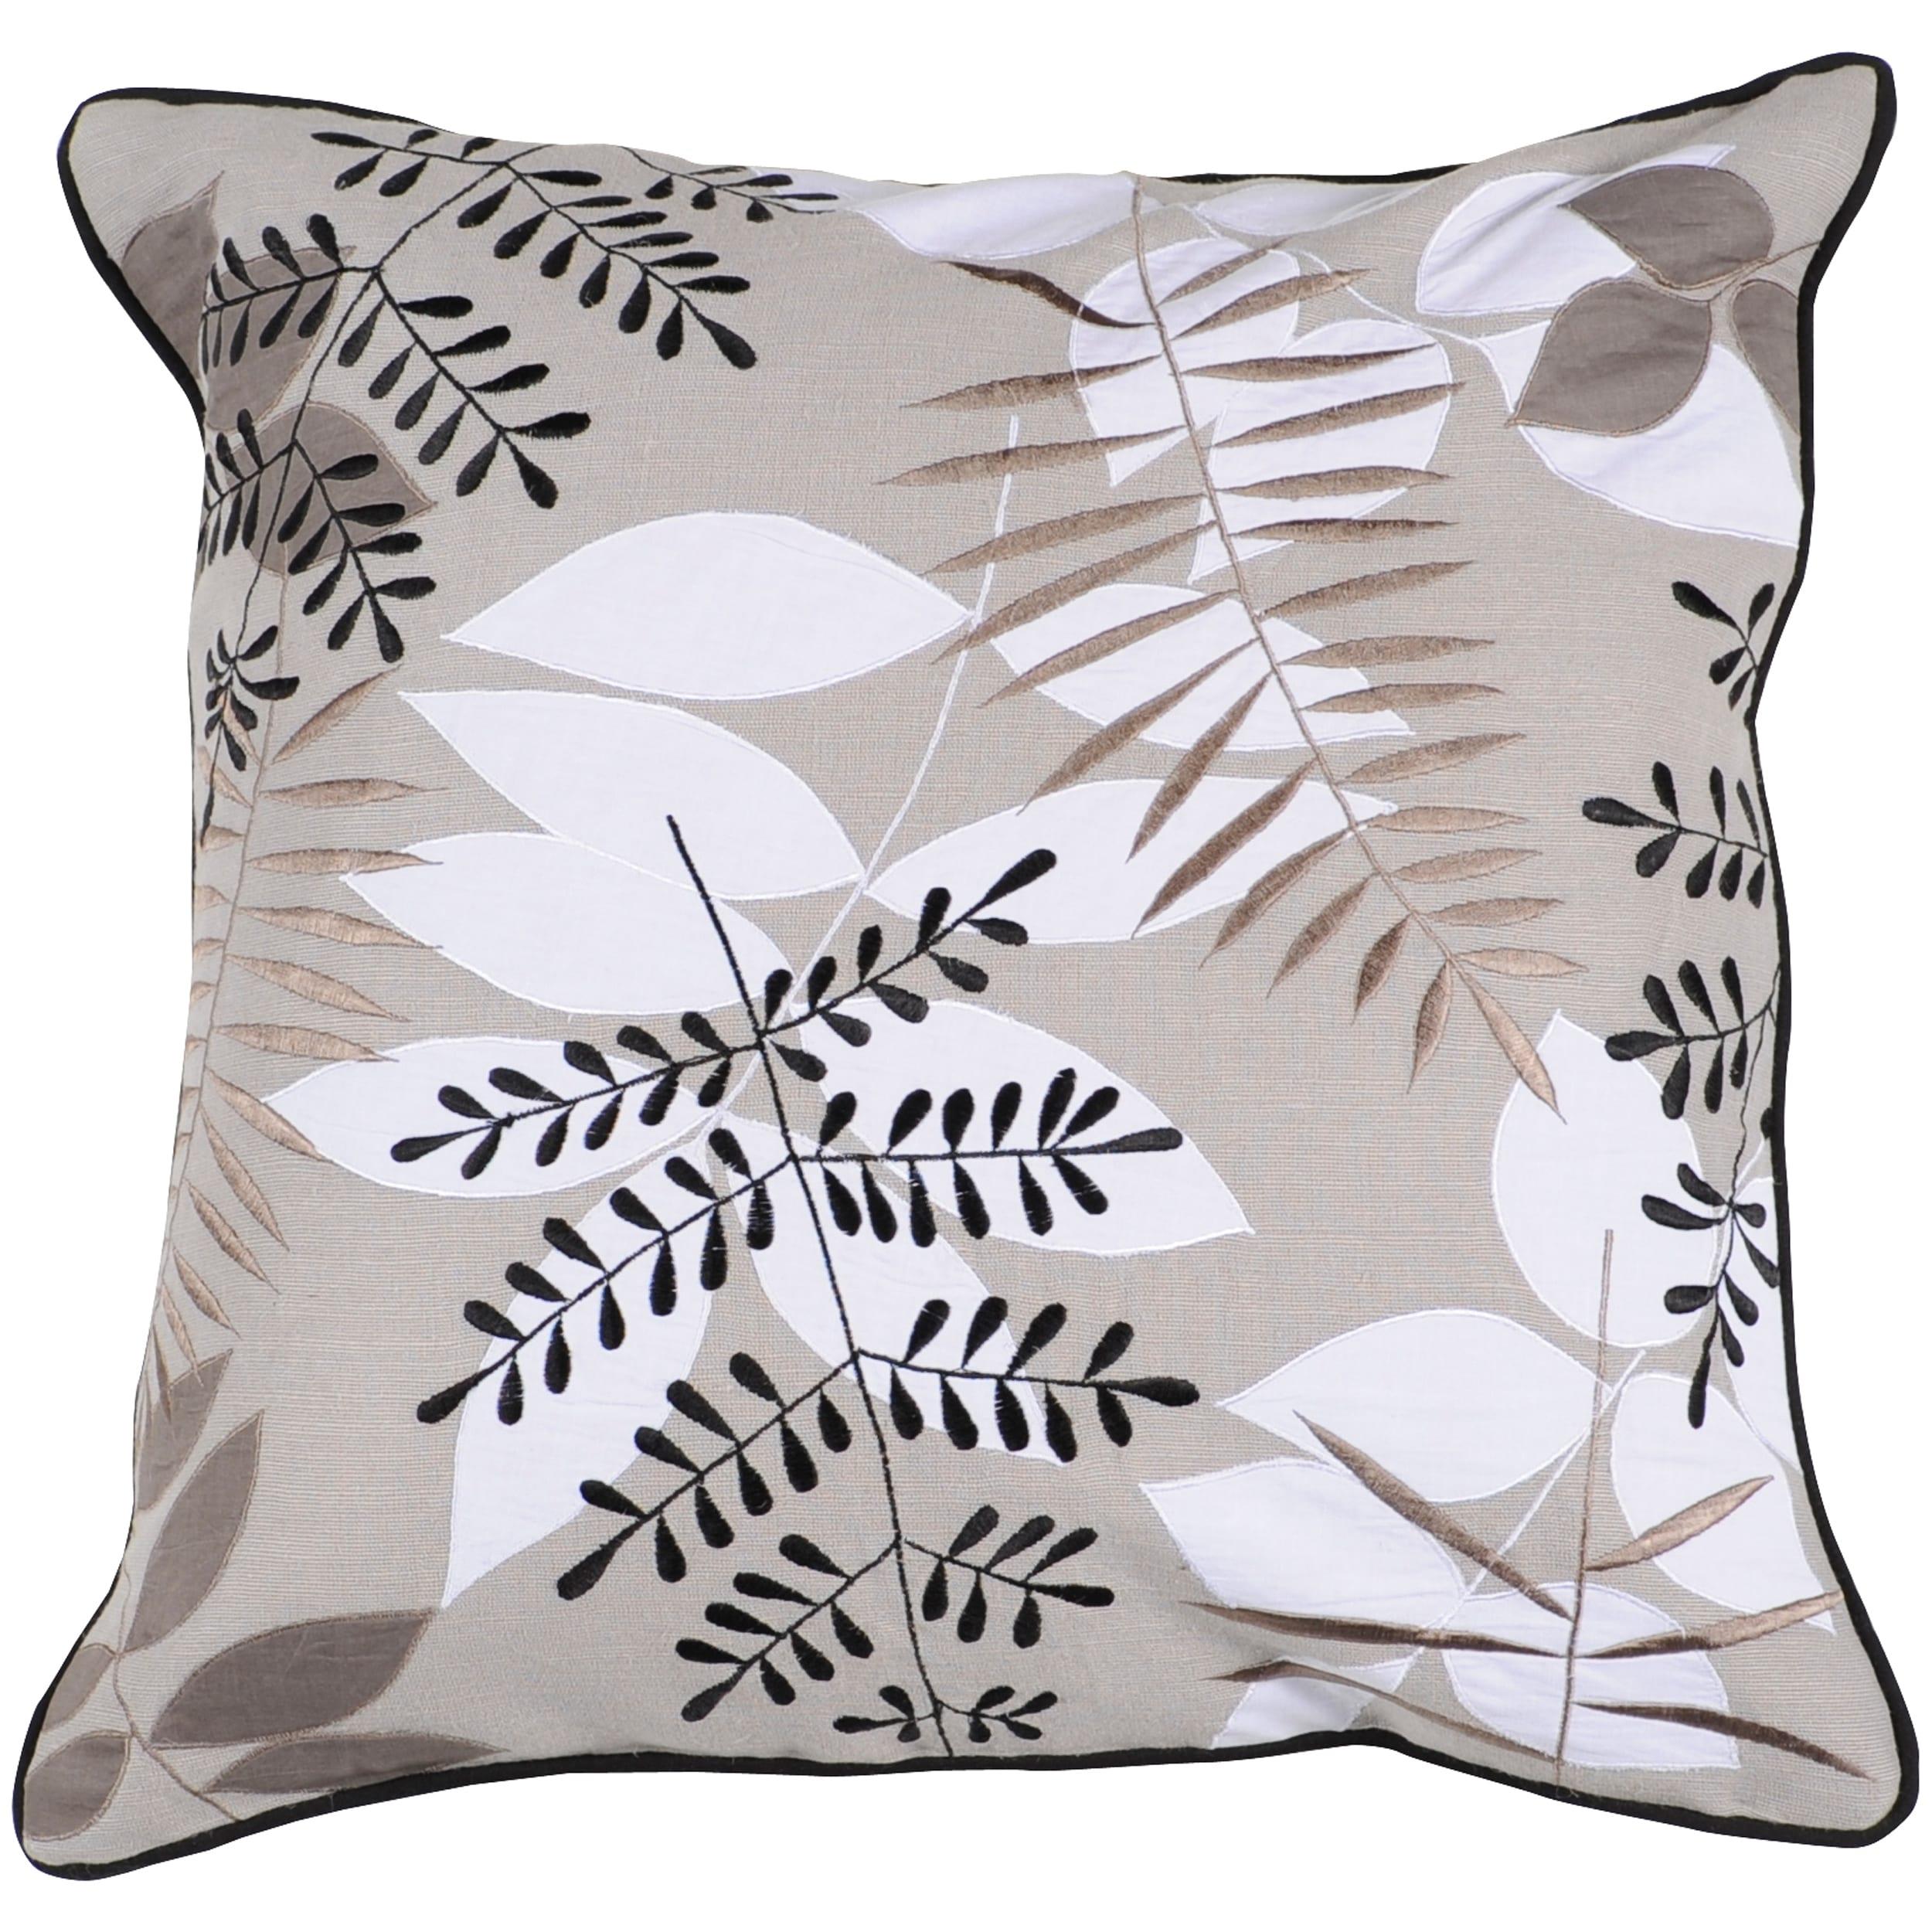 Decorative Hype Down Pillow